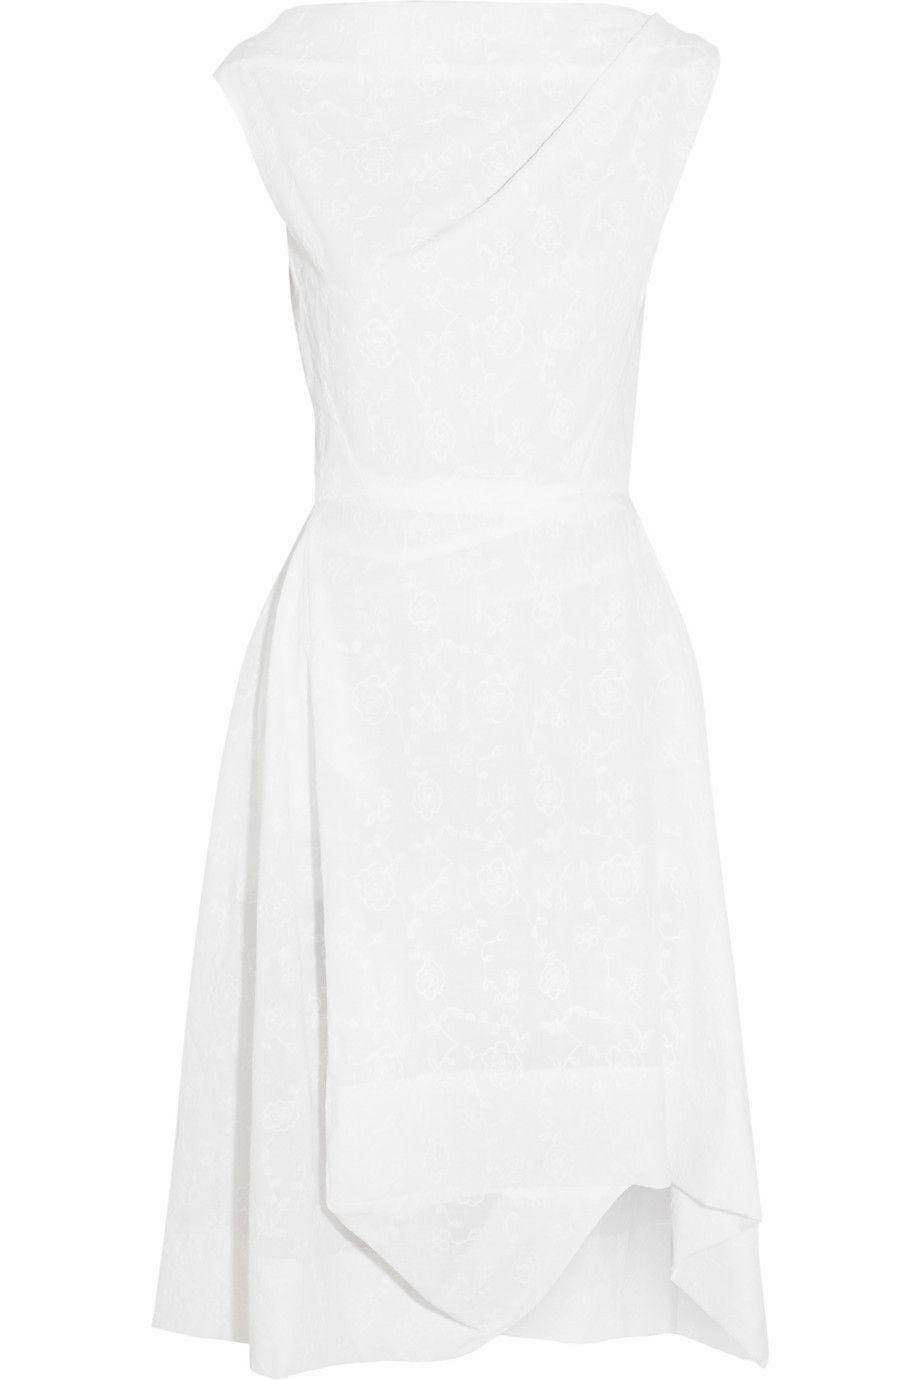 White Aztec Embroidered Cotton Dress Vivienne Westwood Anglomania Cotton Dresses Dresses Vivienne Westwood Anglomania [ 1380 x 920 Pixel ]